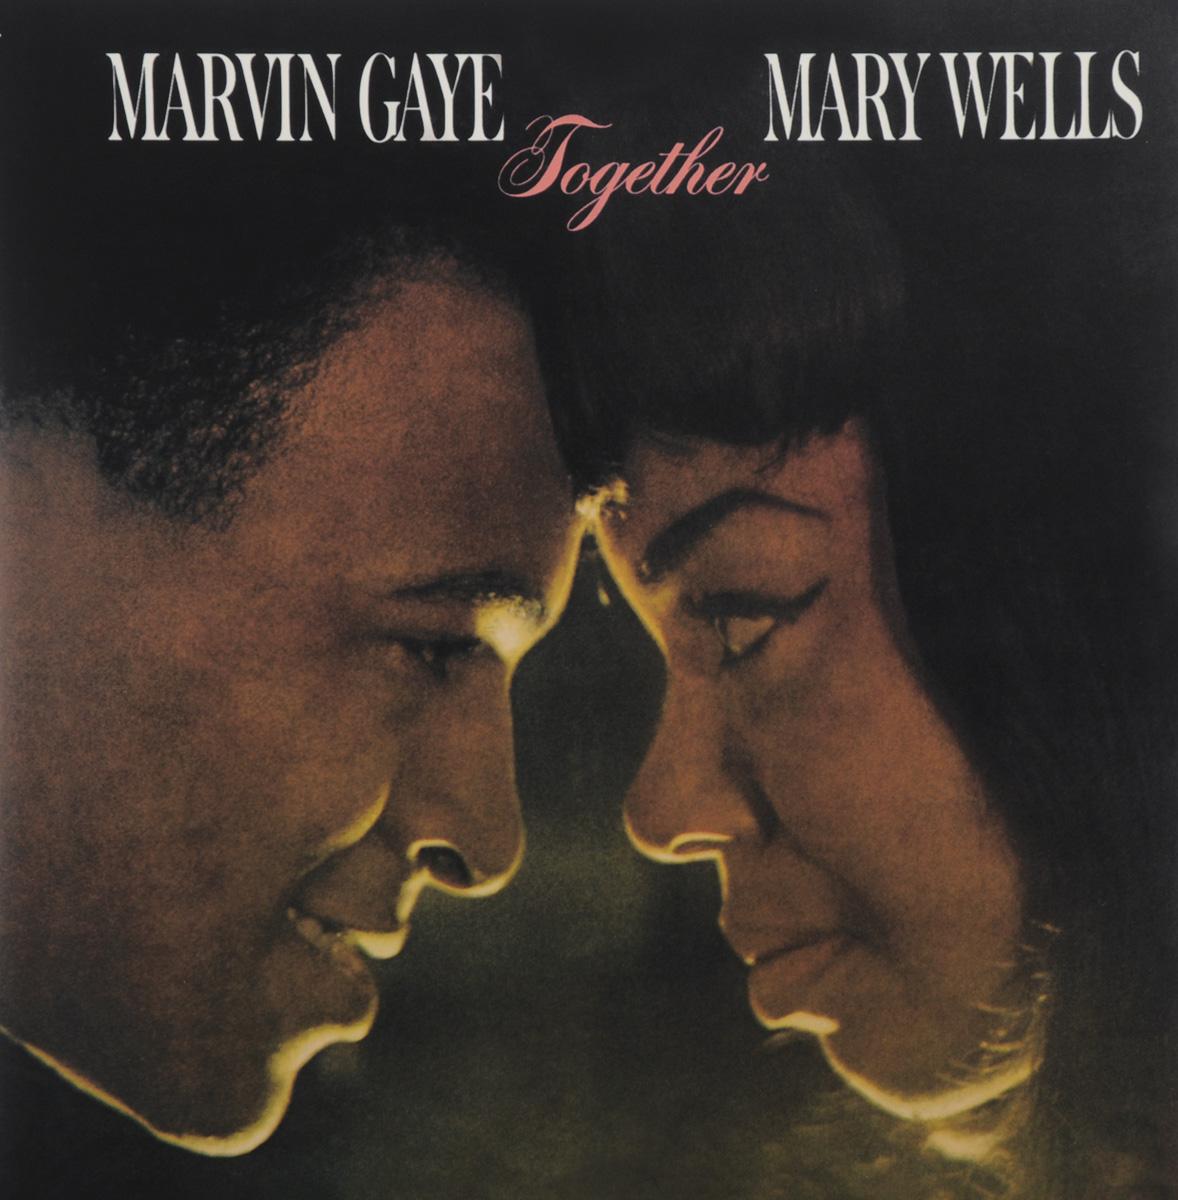 Марвин Гэй,Мэри Уэллс Marvin Gaye And Mary Wells. Together (LP) marvin gaye marvin gaye here my dear 2 lp